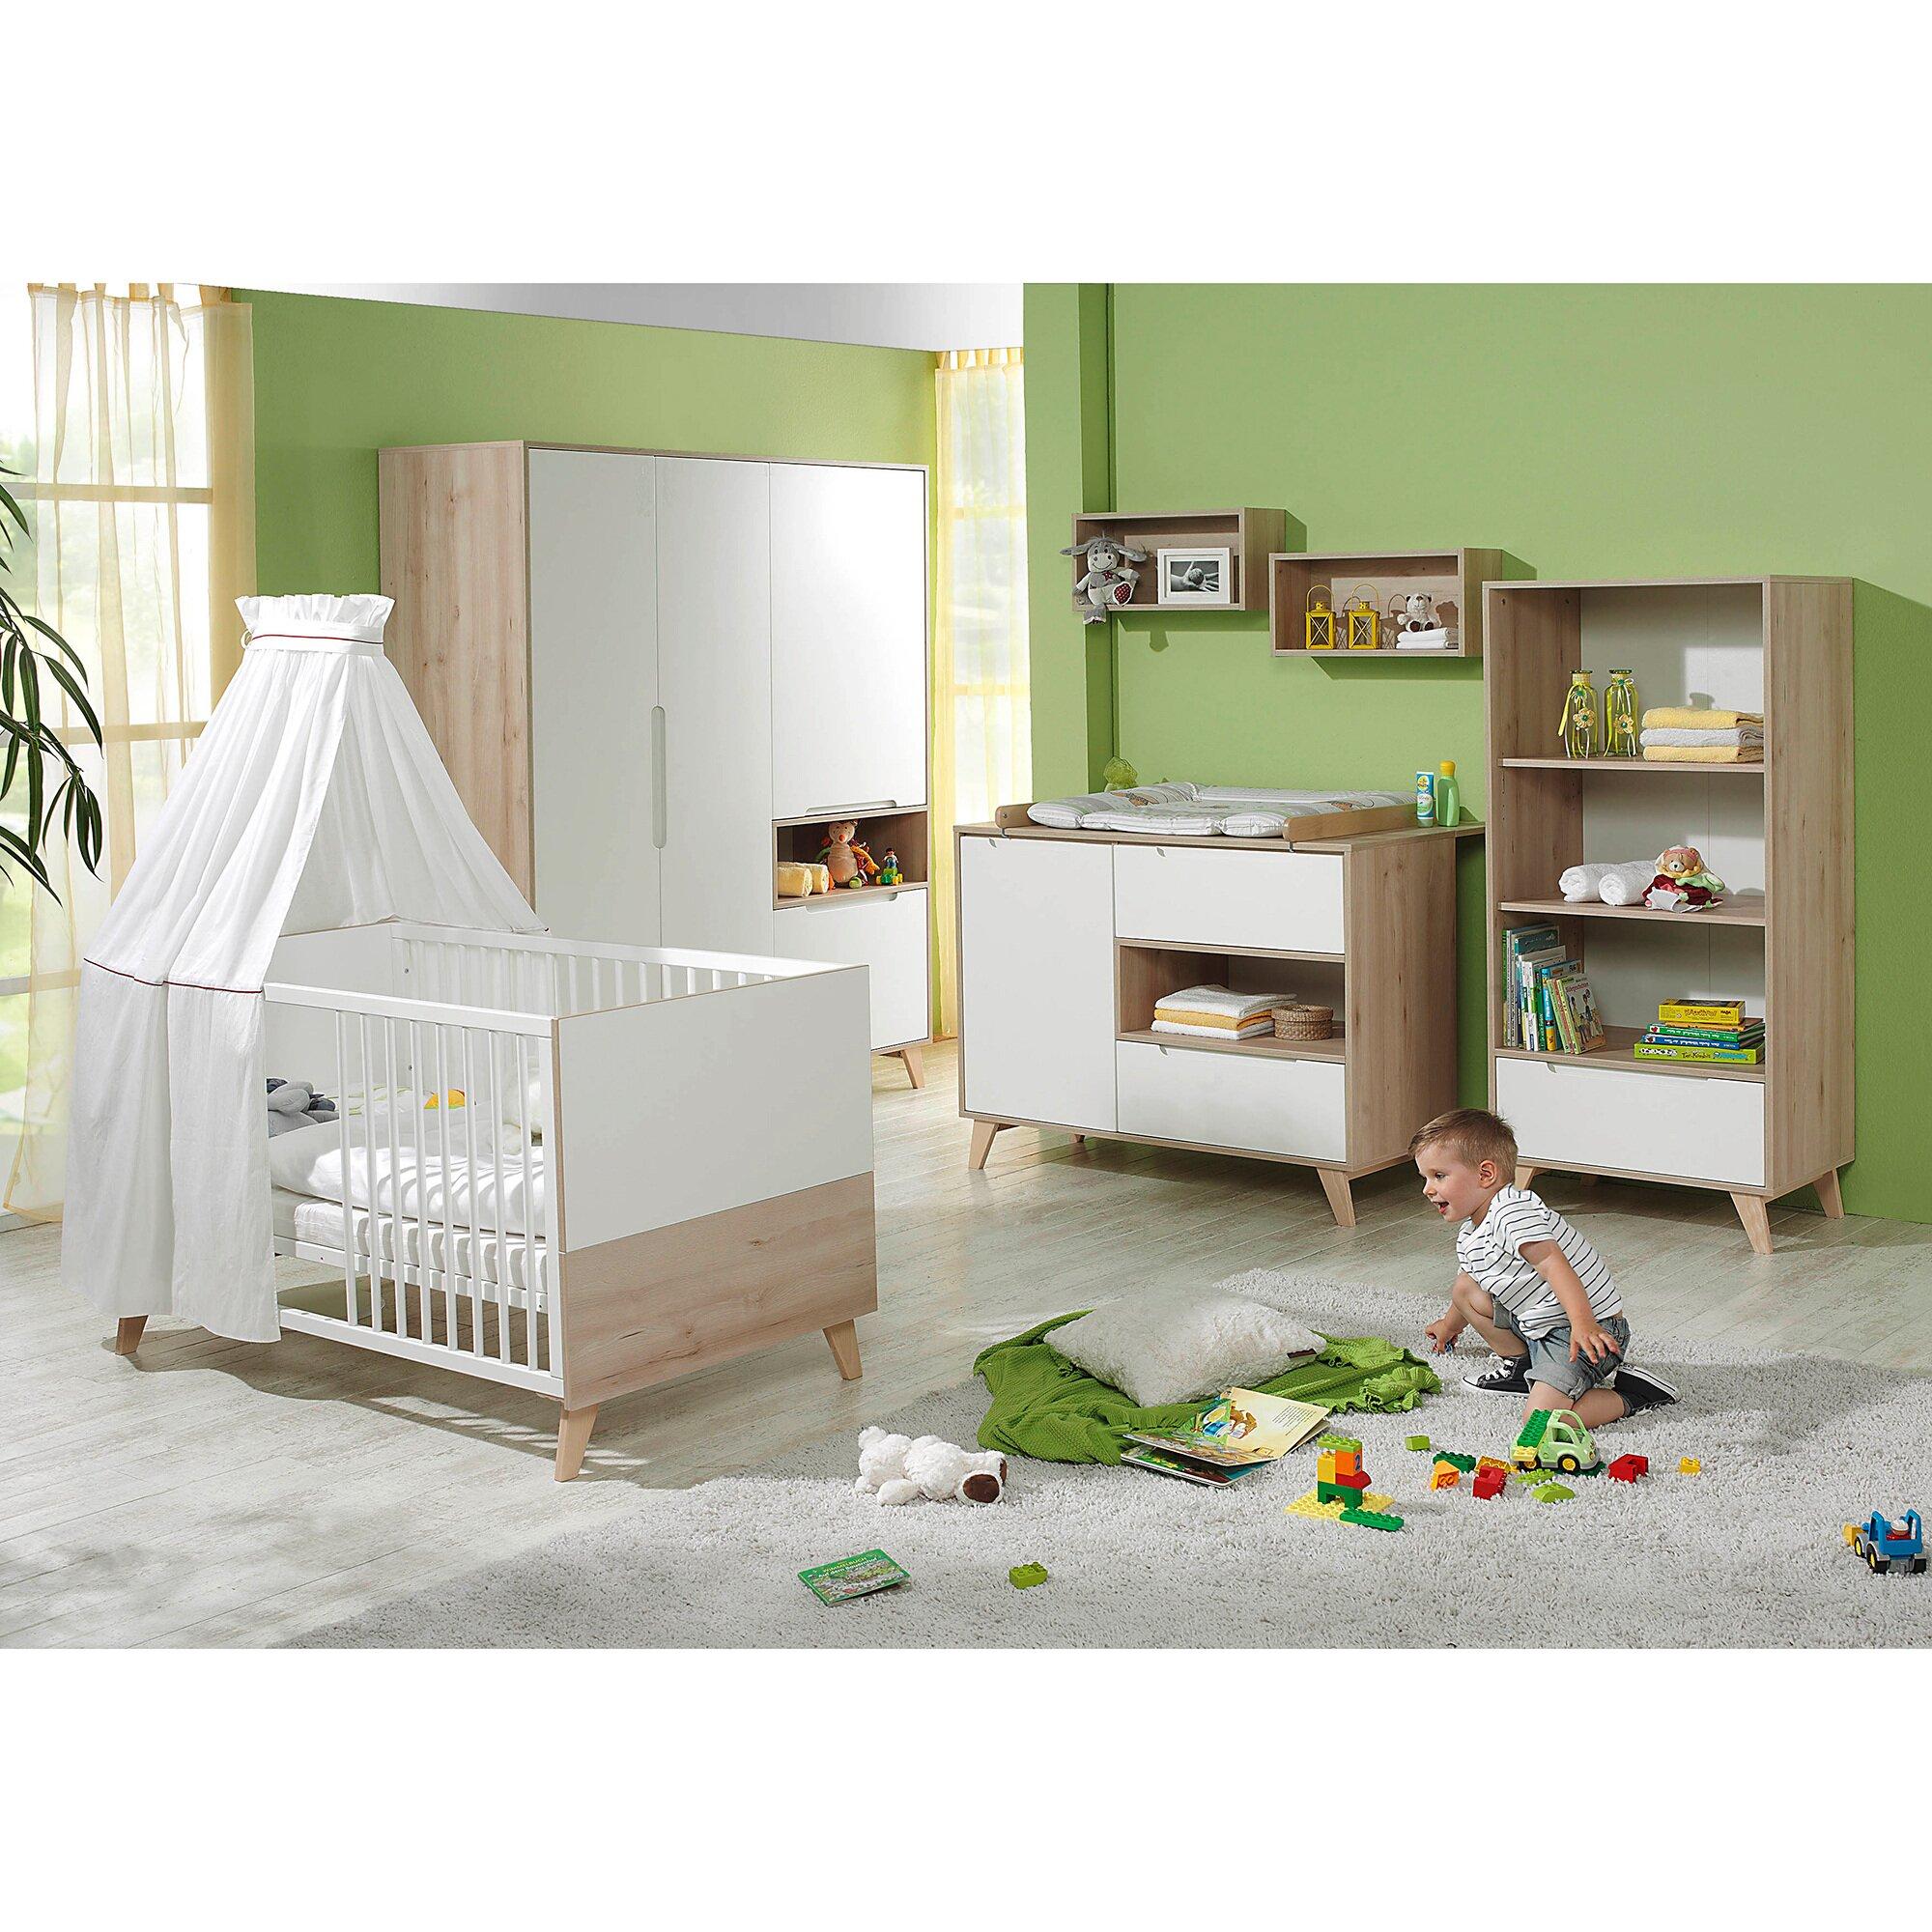 Geuther 3-tlg. Babyzimmer Mette